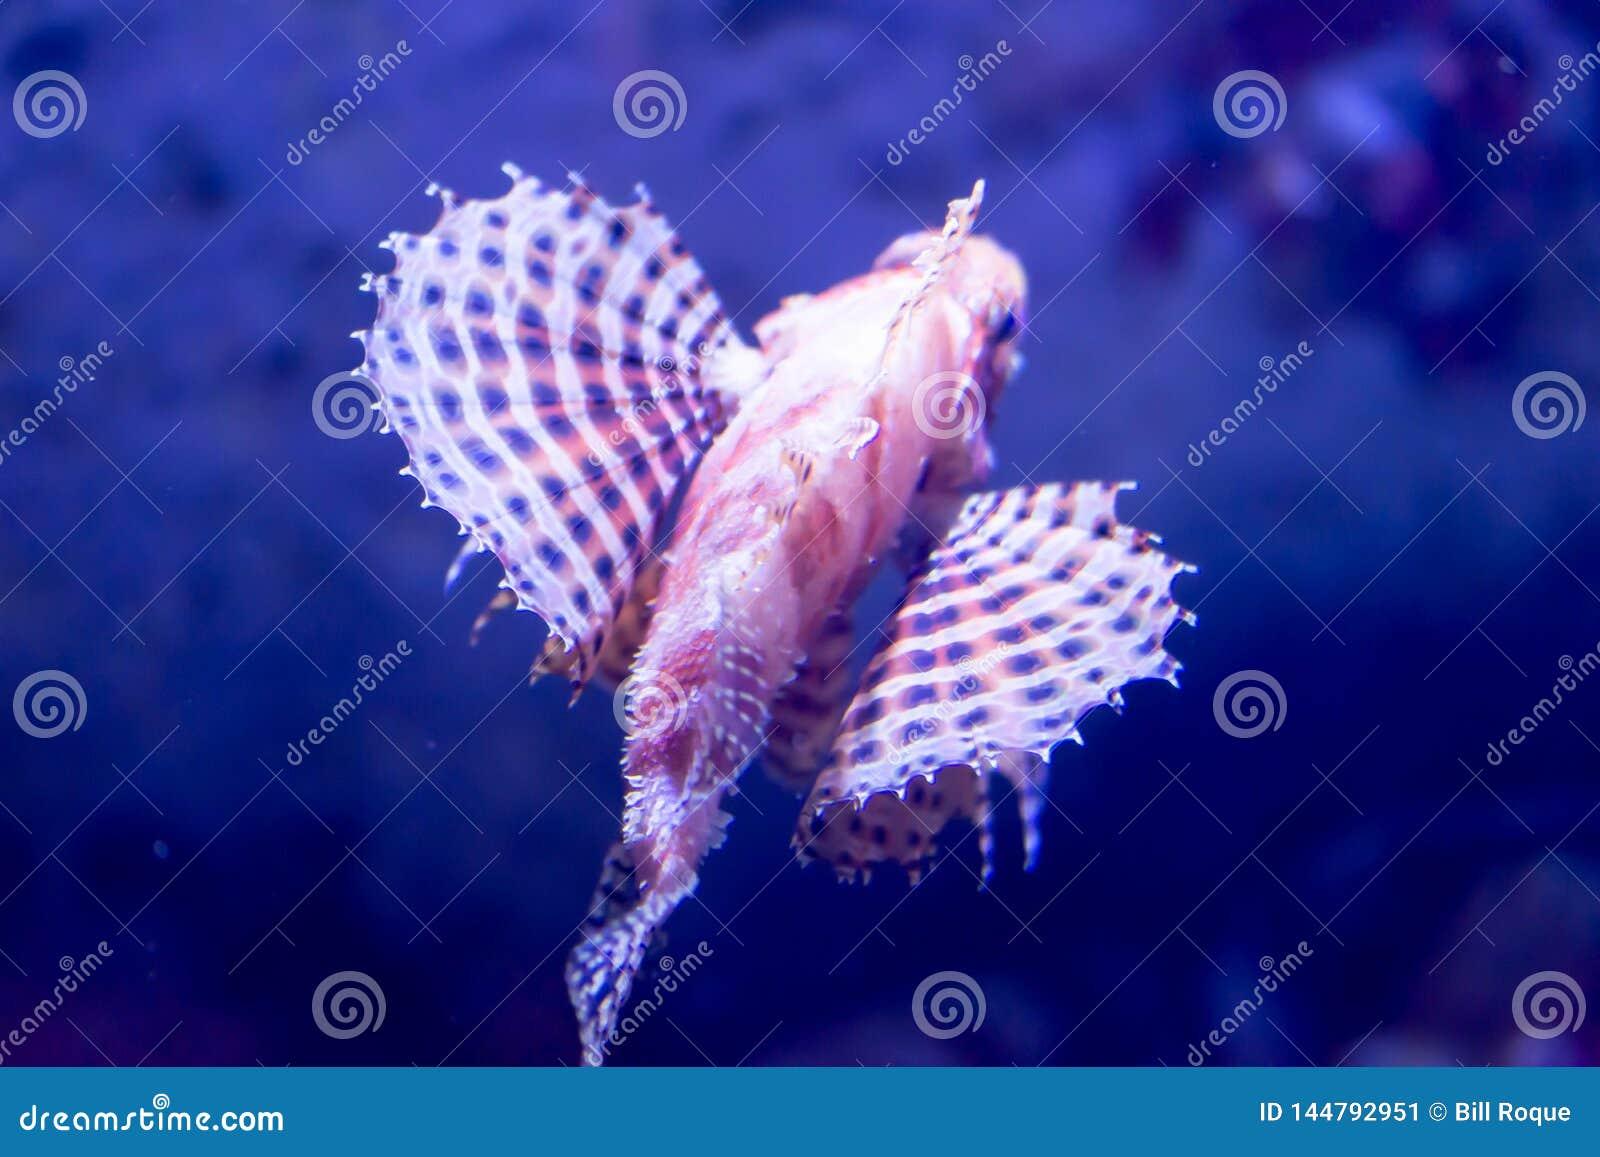 Blurry photo of a Dendrochirus zebra Zebra Lionfish zebra turkeyfish in a sea aquarium